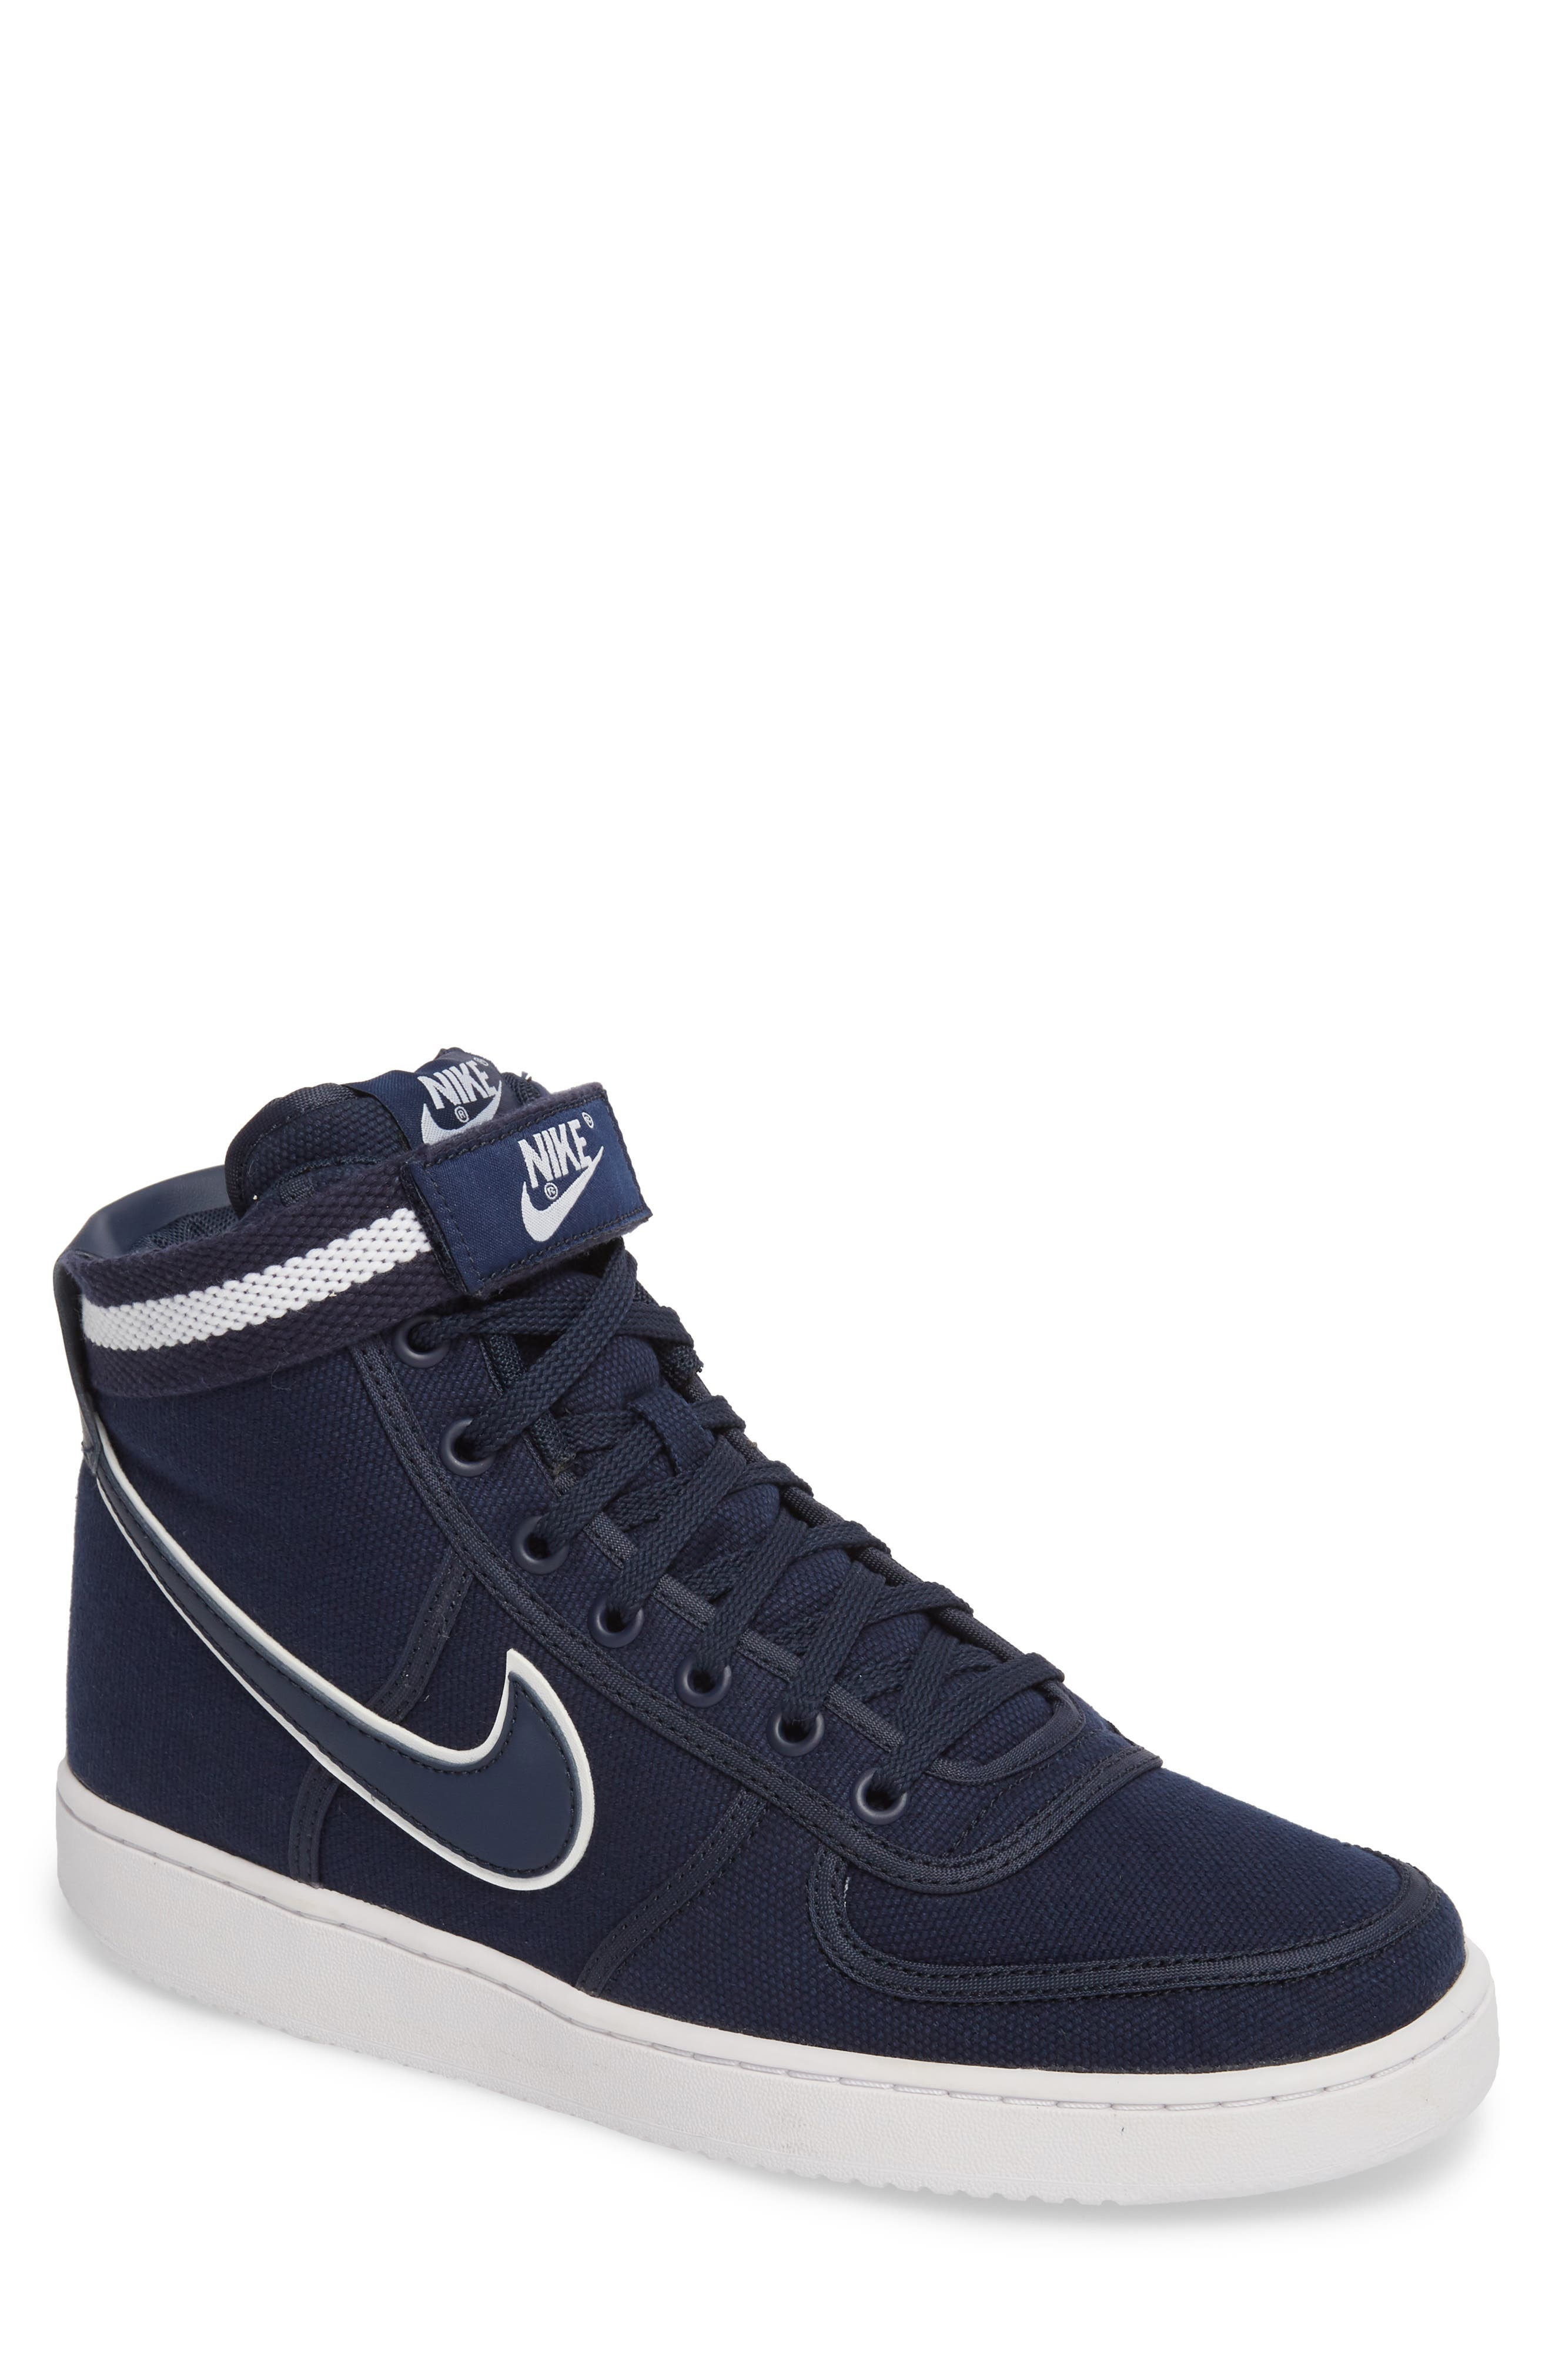 Nike Vandal High Supreme High Top Sneaker (Men)